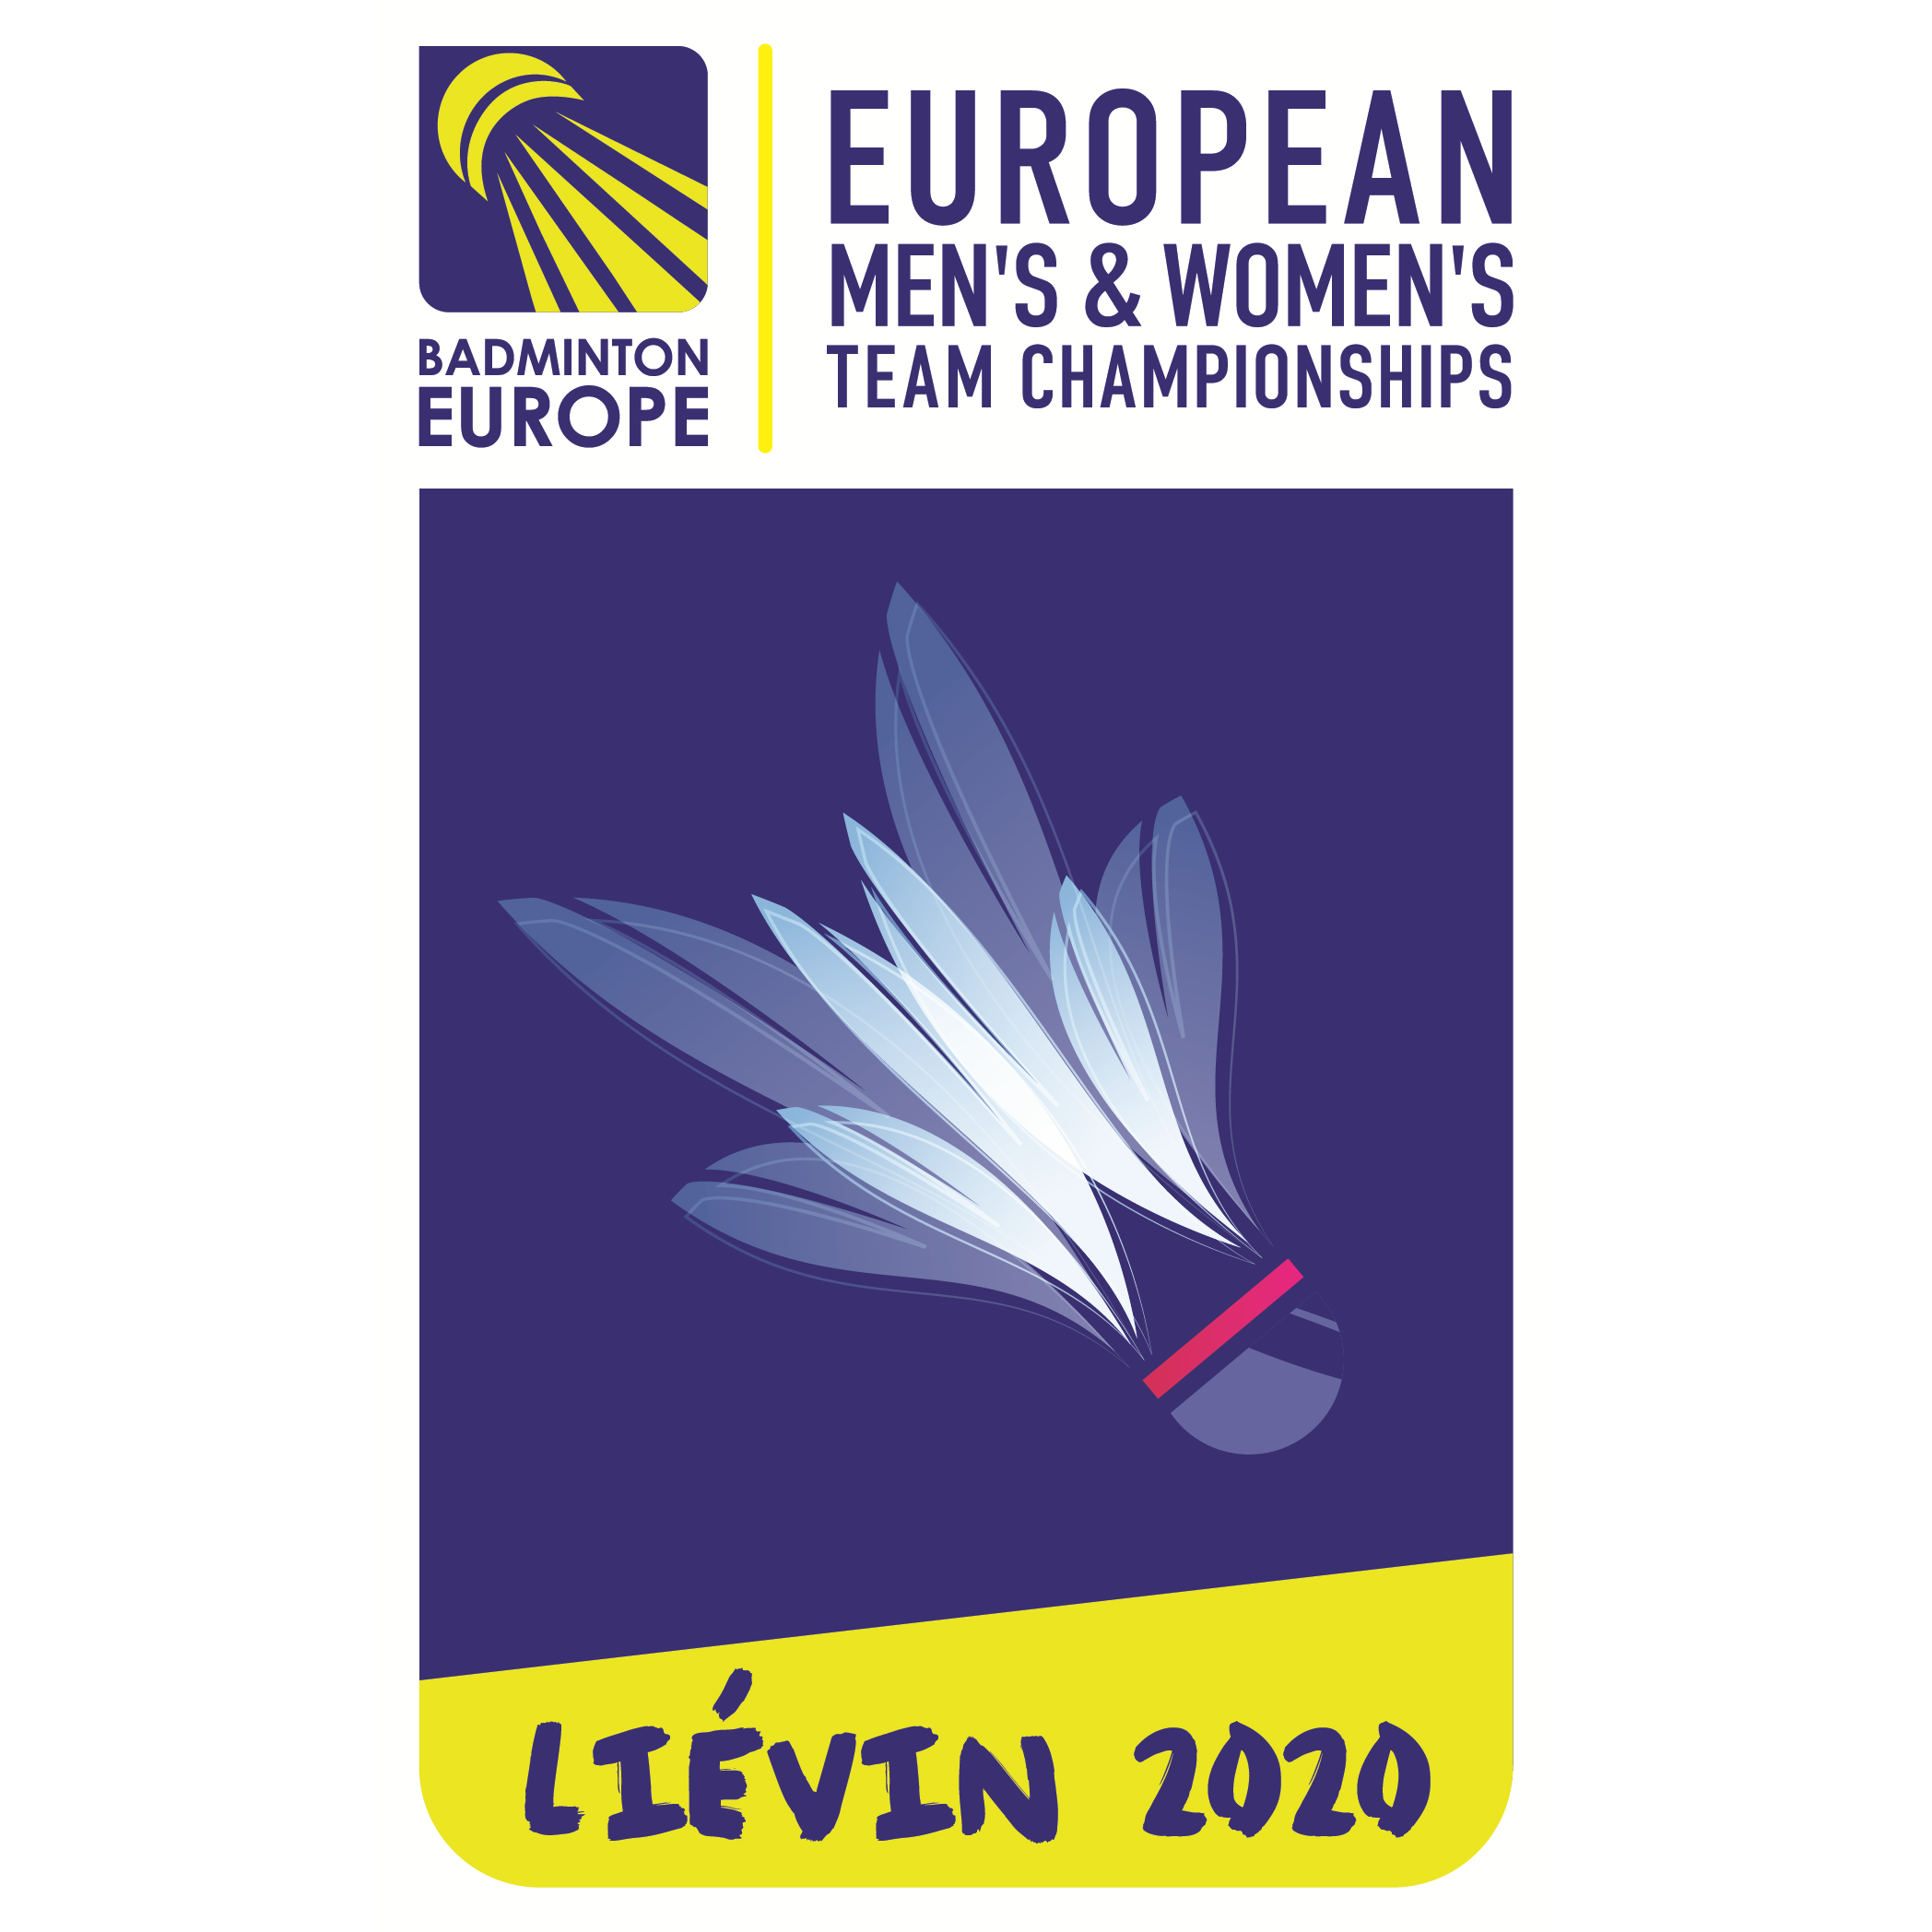 2020 European Team Badminton Championships